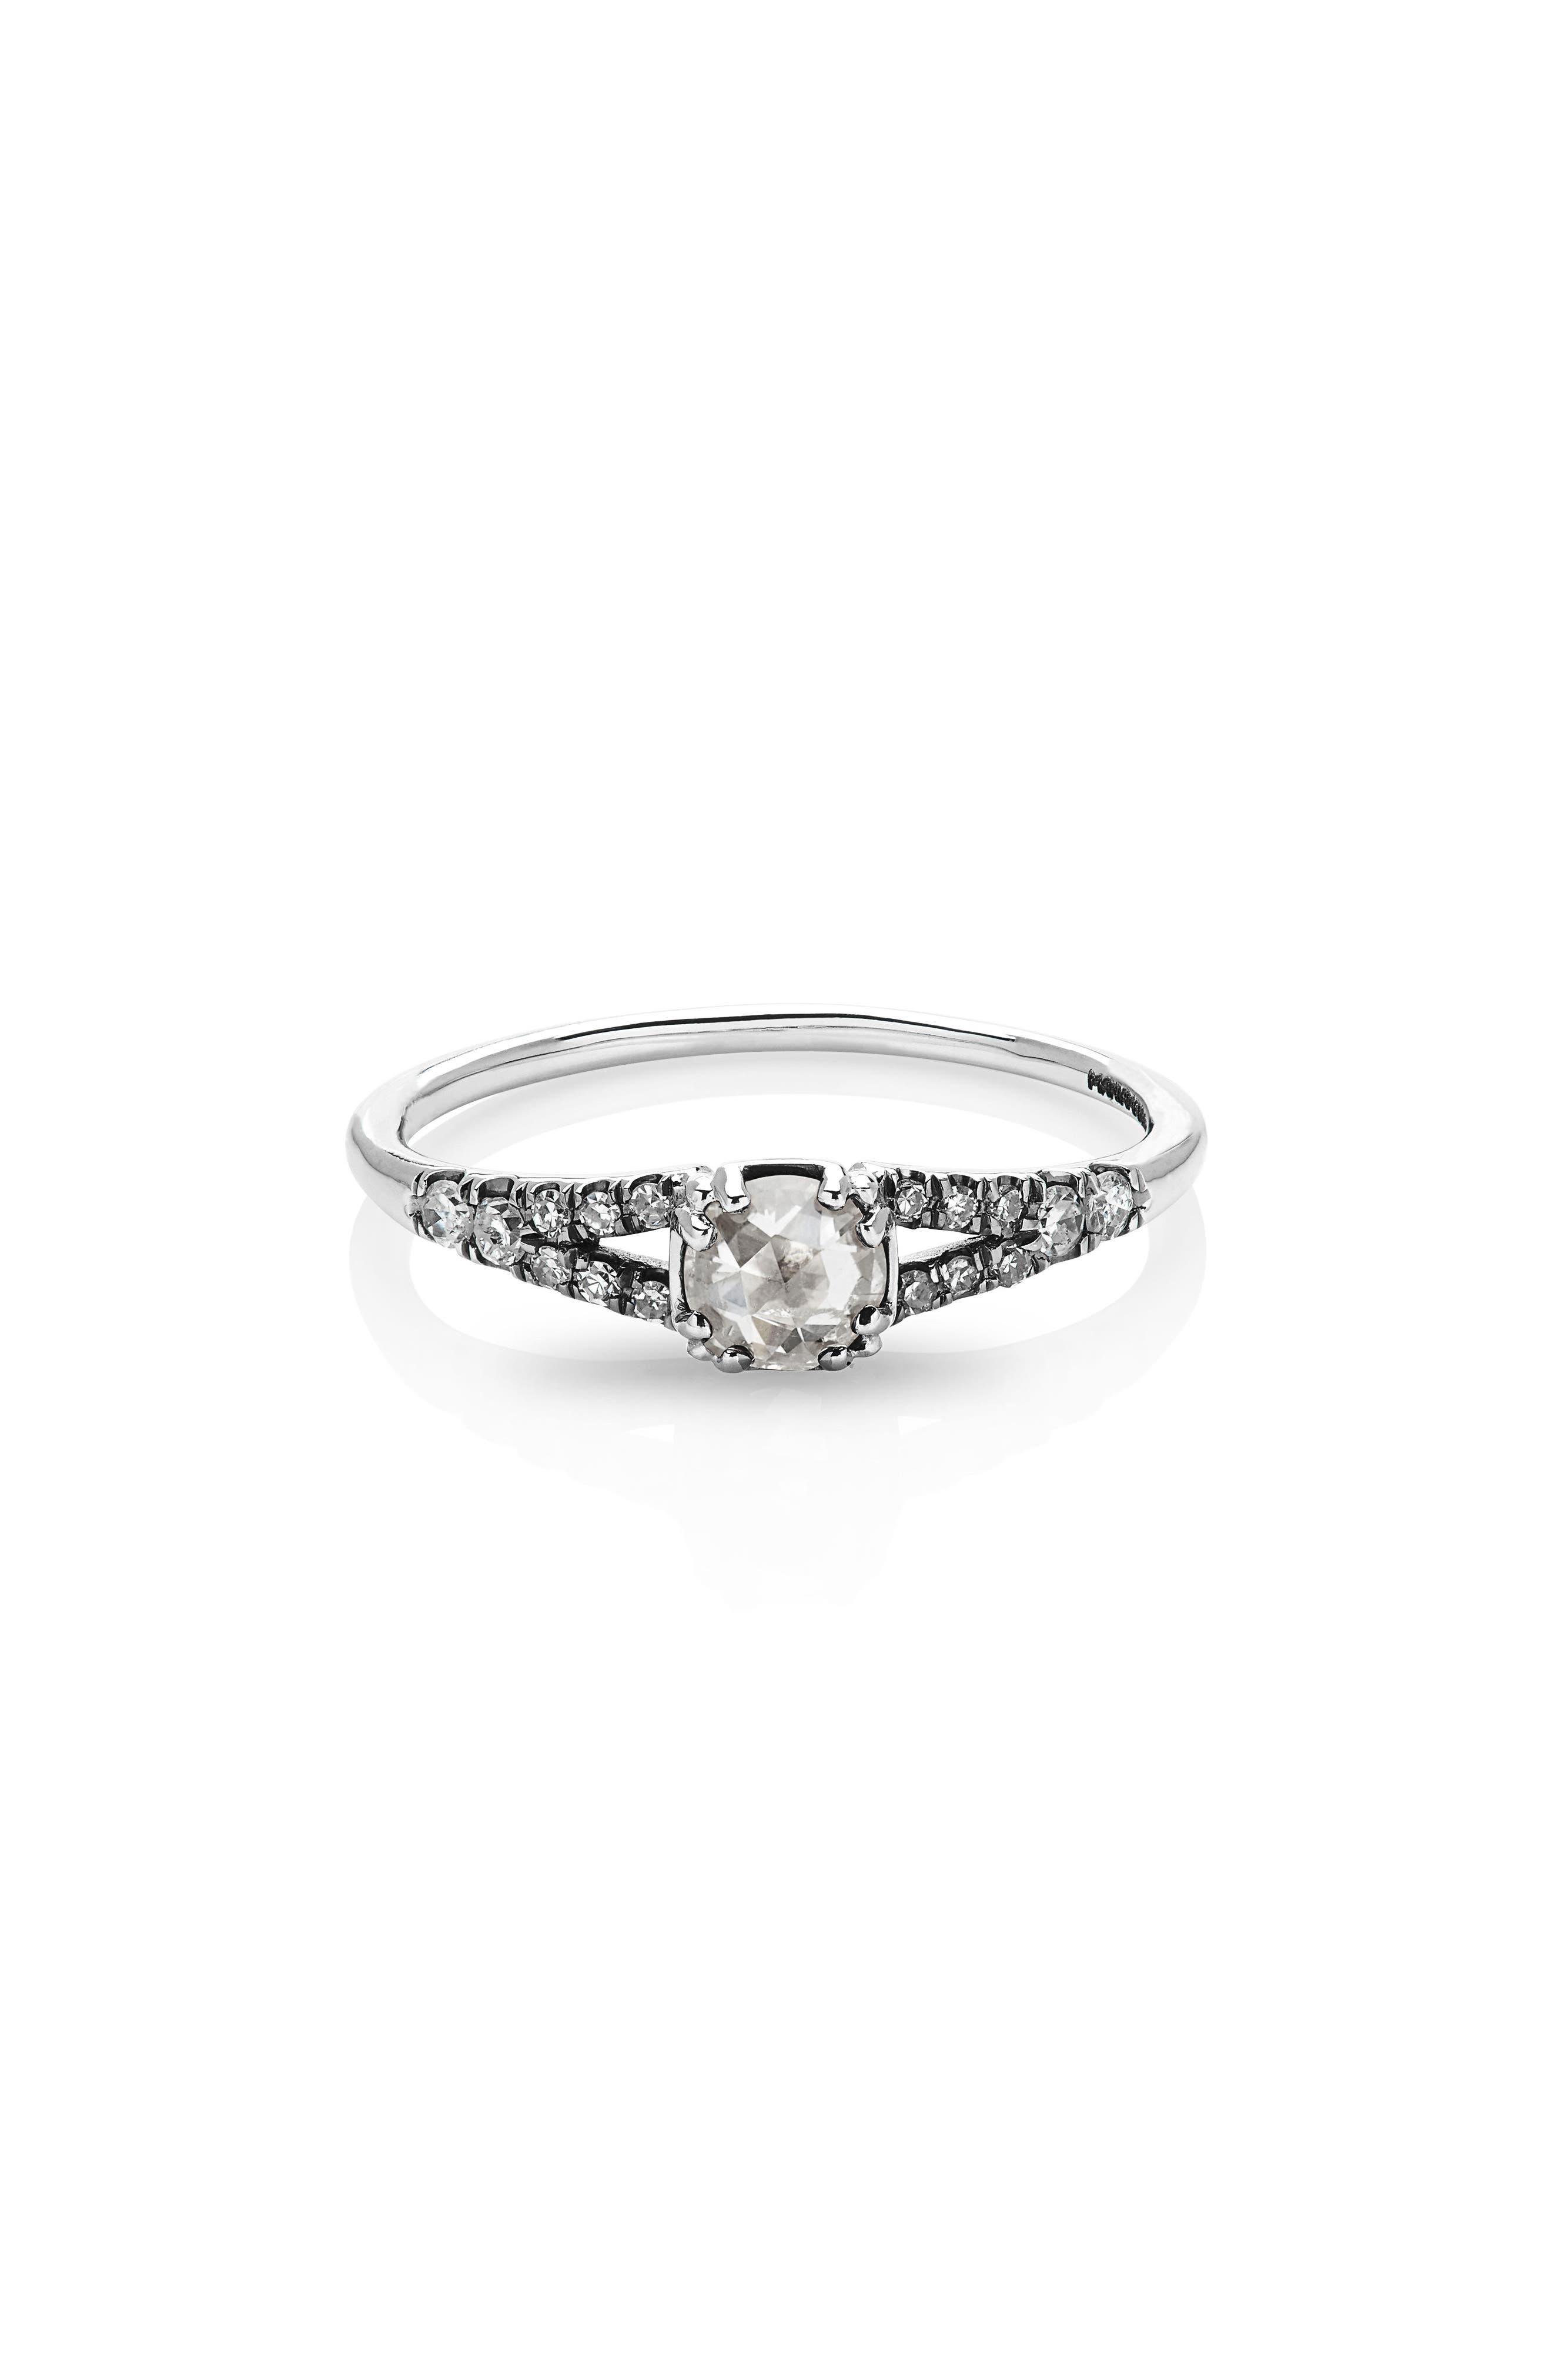 Alternate Image 1 Selected - Maniamania Devotion Solitaire Diamond Ring